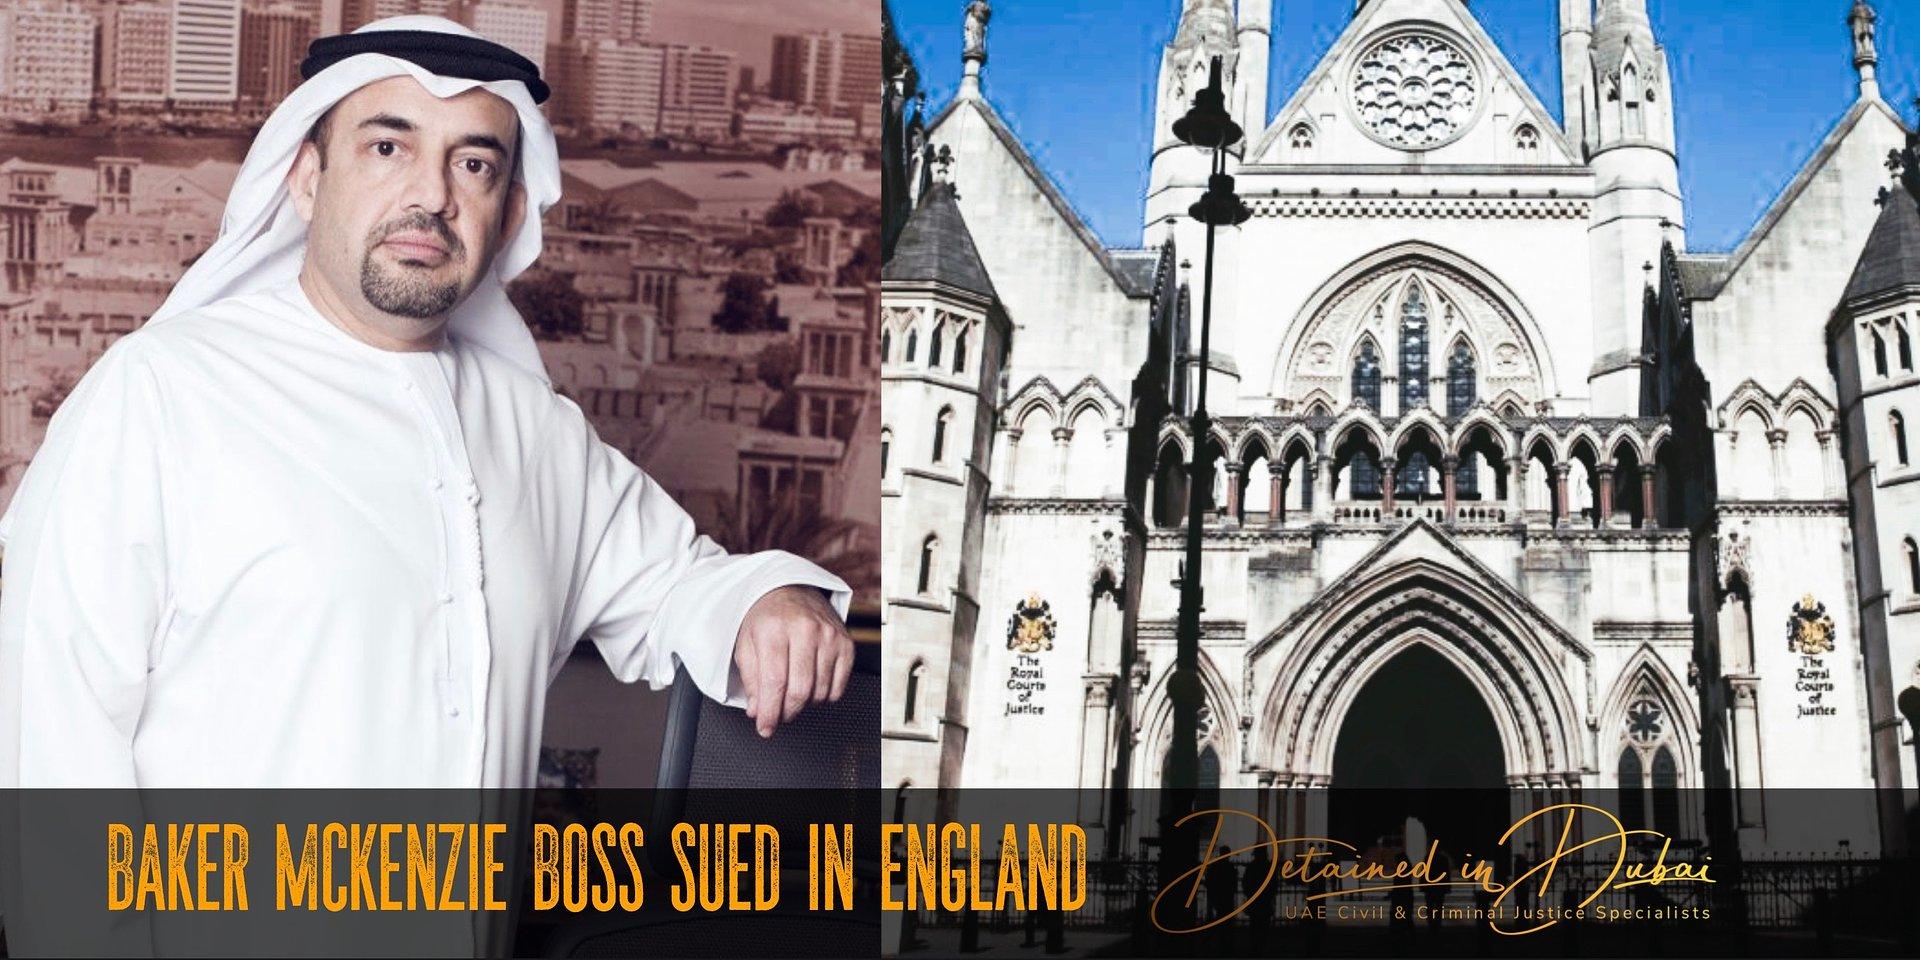 UK lawsuit alleges 'stunningly blatant corruption' of leading UAE figures, Baker Mckenzie chairman.